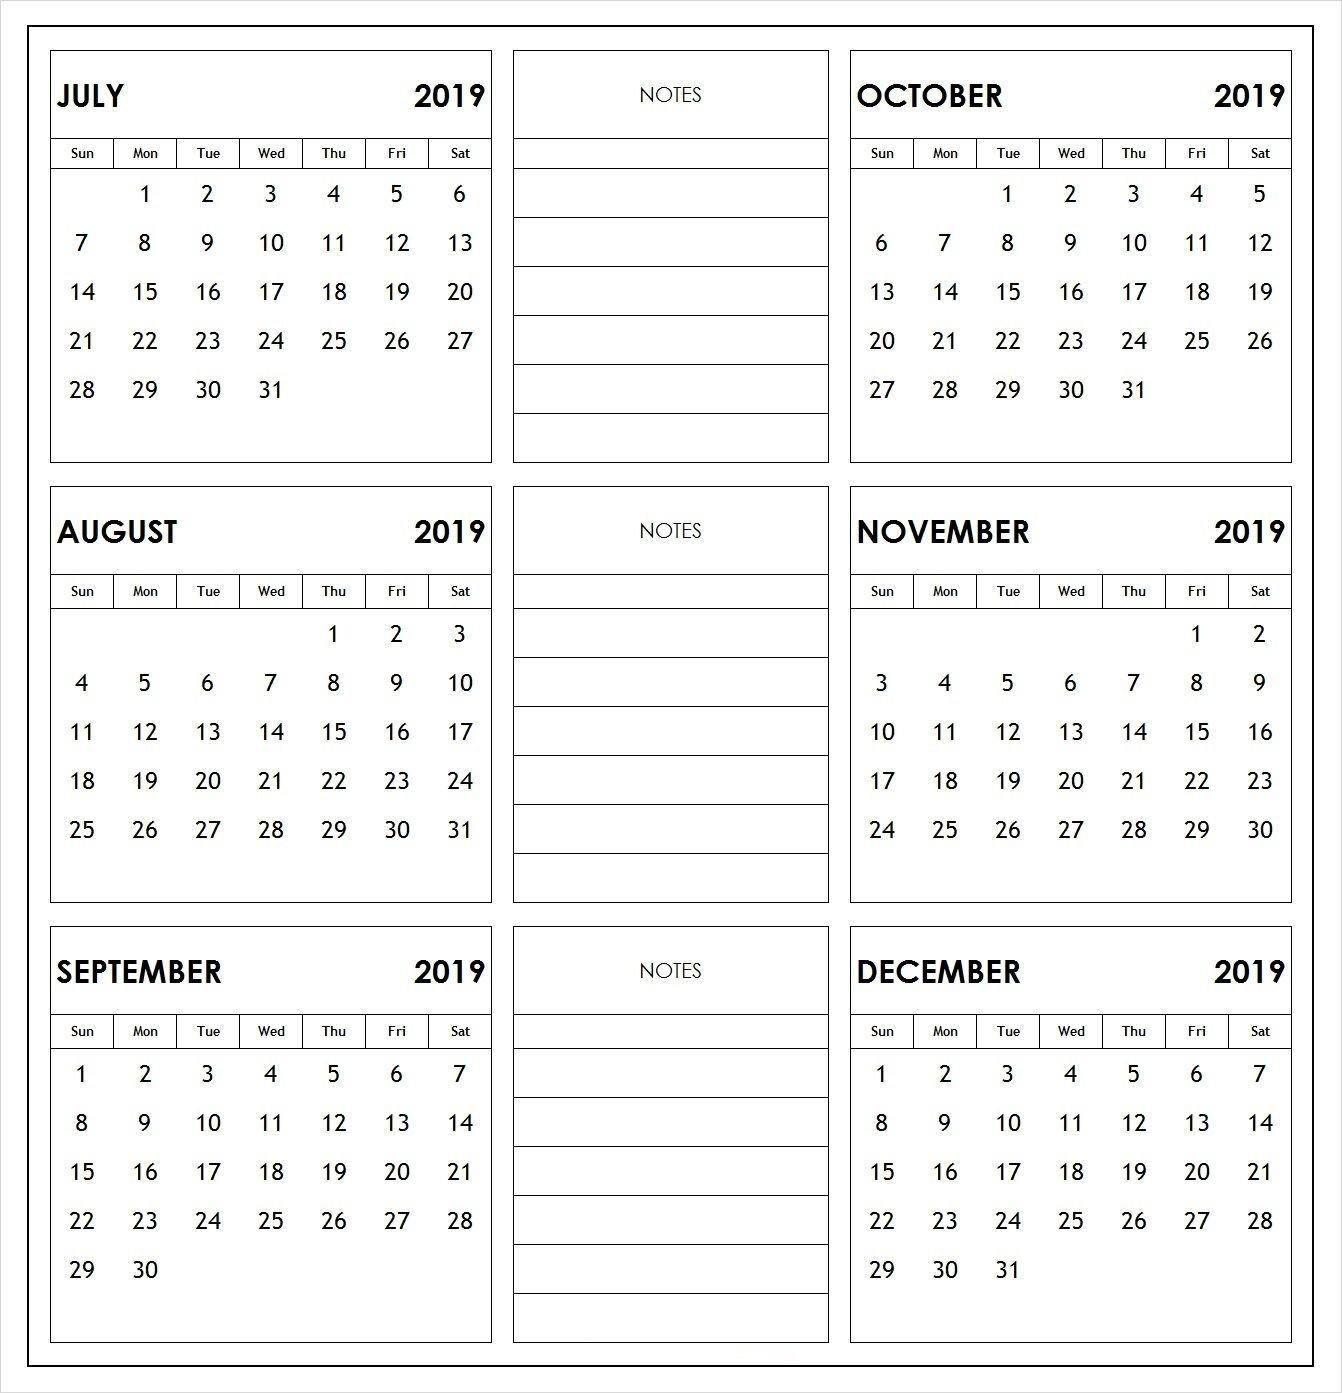 2019 Half Year Print Calendar   2019 Calendars   Academic Calendar 6 Month Calendar 2019